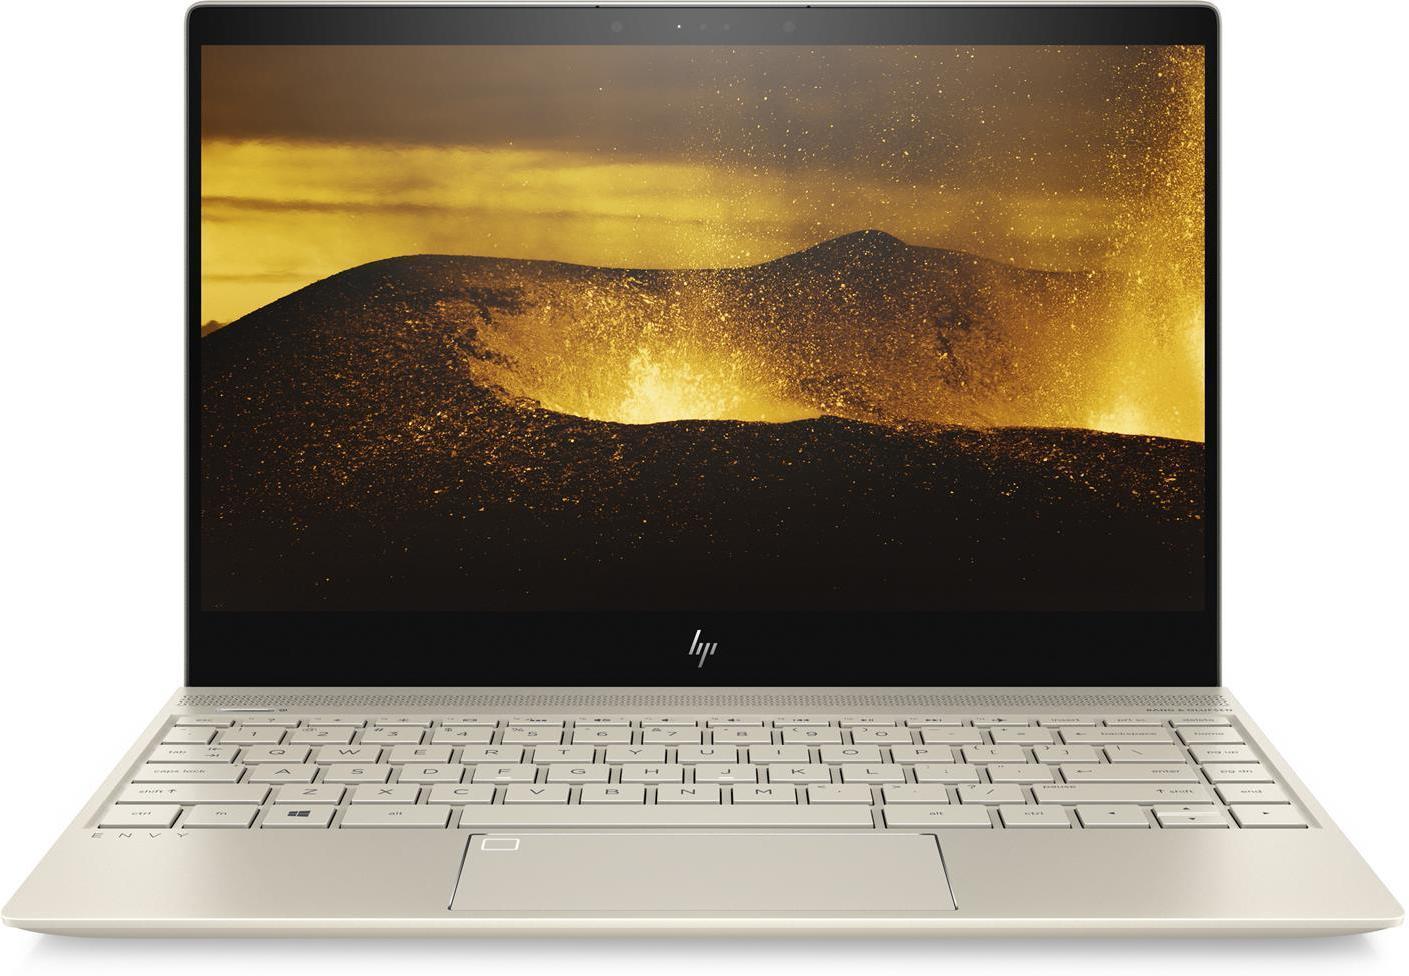 Kendte Gaming laptop - bærbar PC - Se best pris før kjøp i Prisguiden RP-89